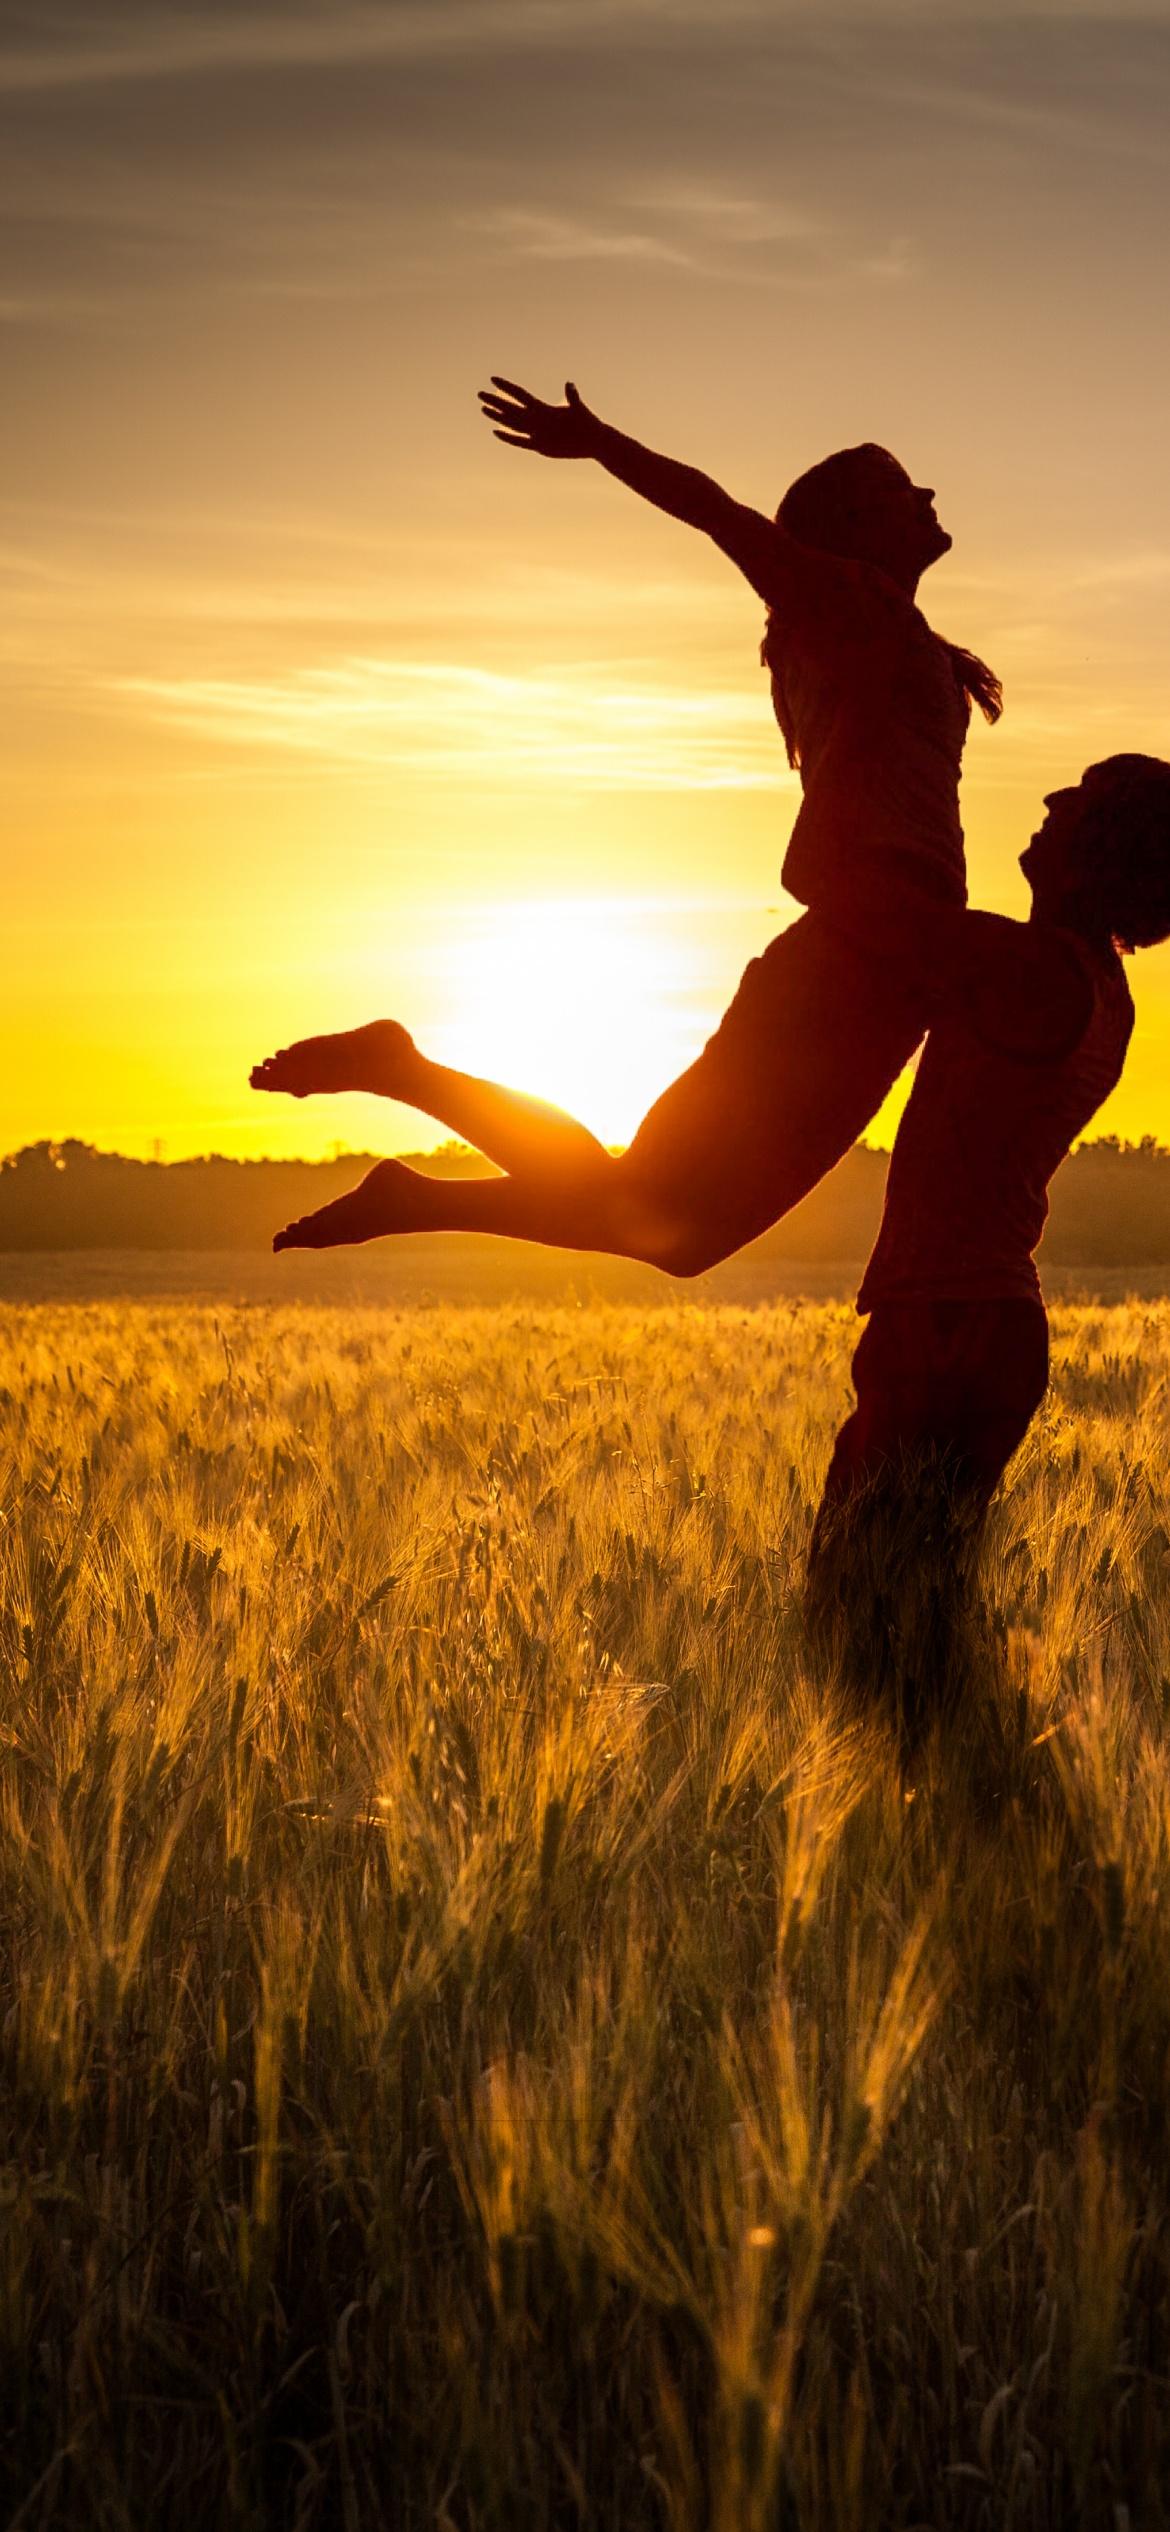 Couple 4K Wallpaper, Silhouette, Sunset, Romantic